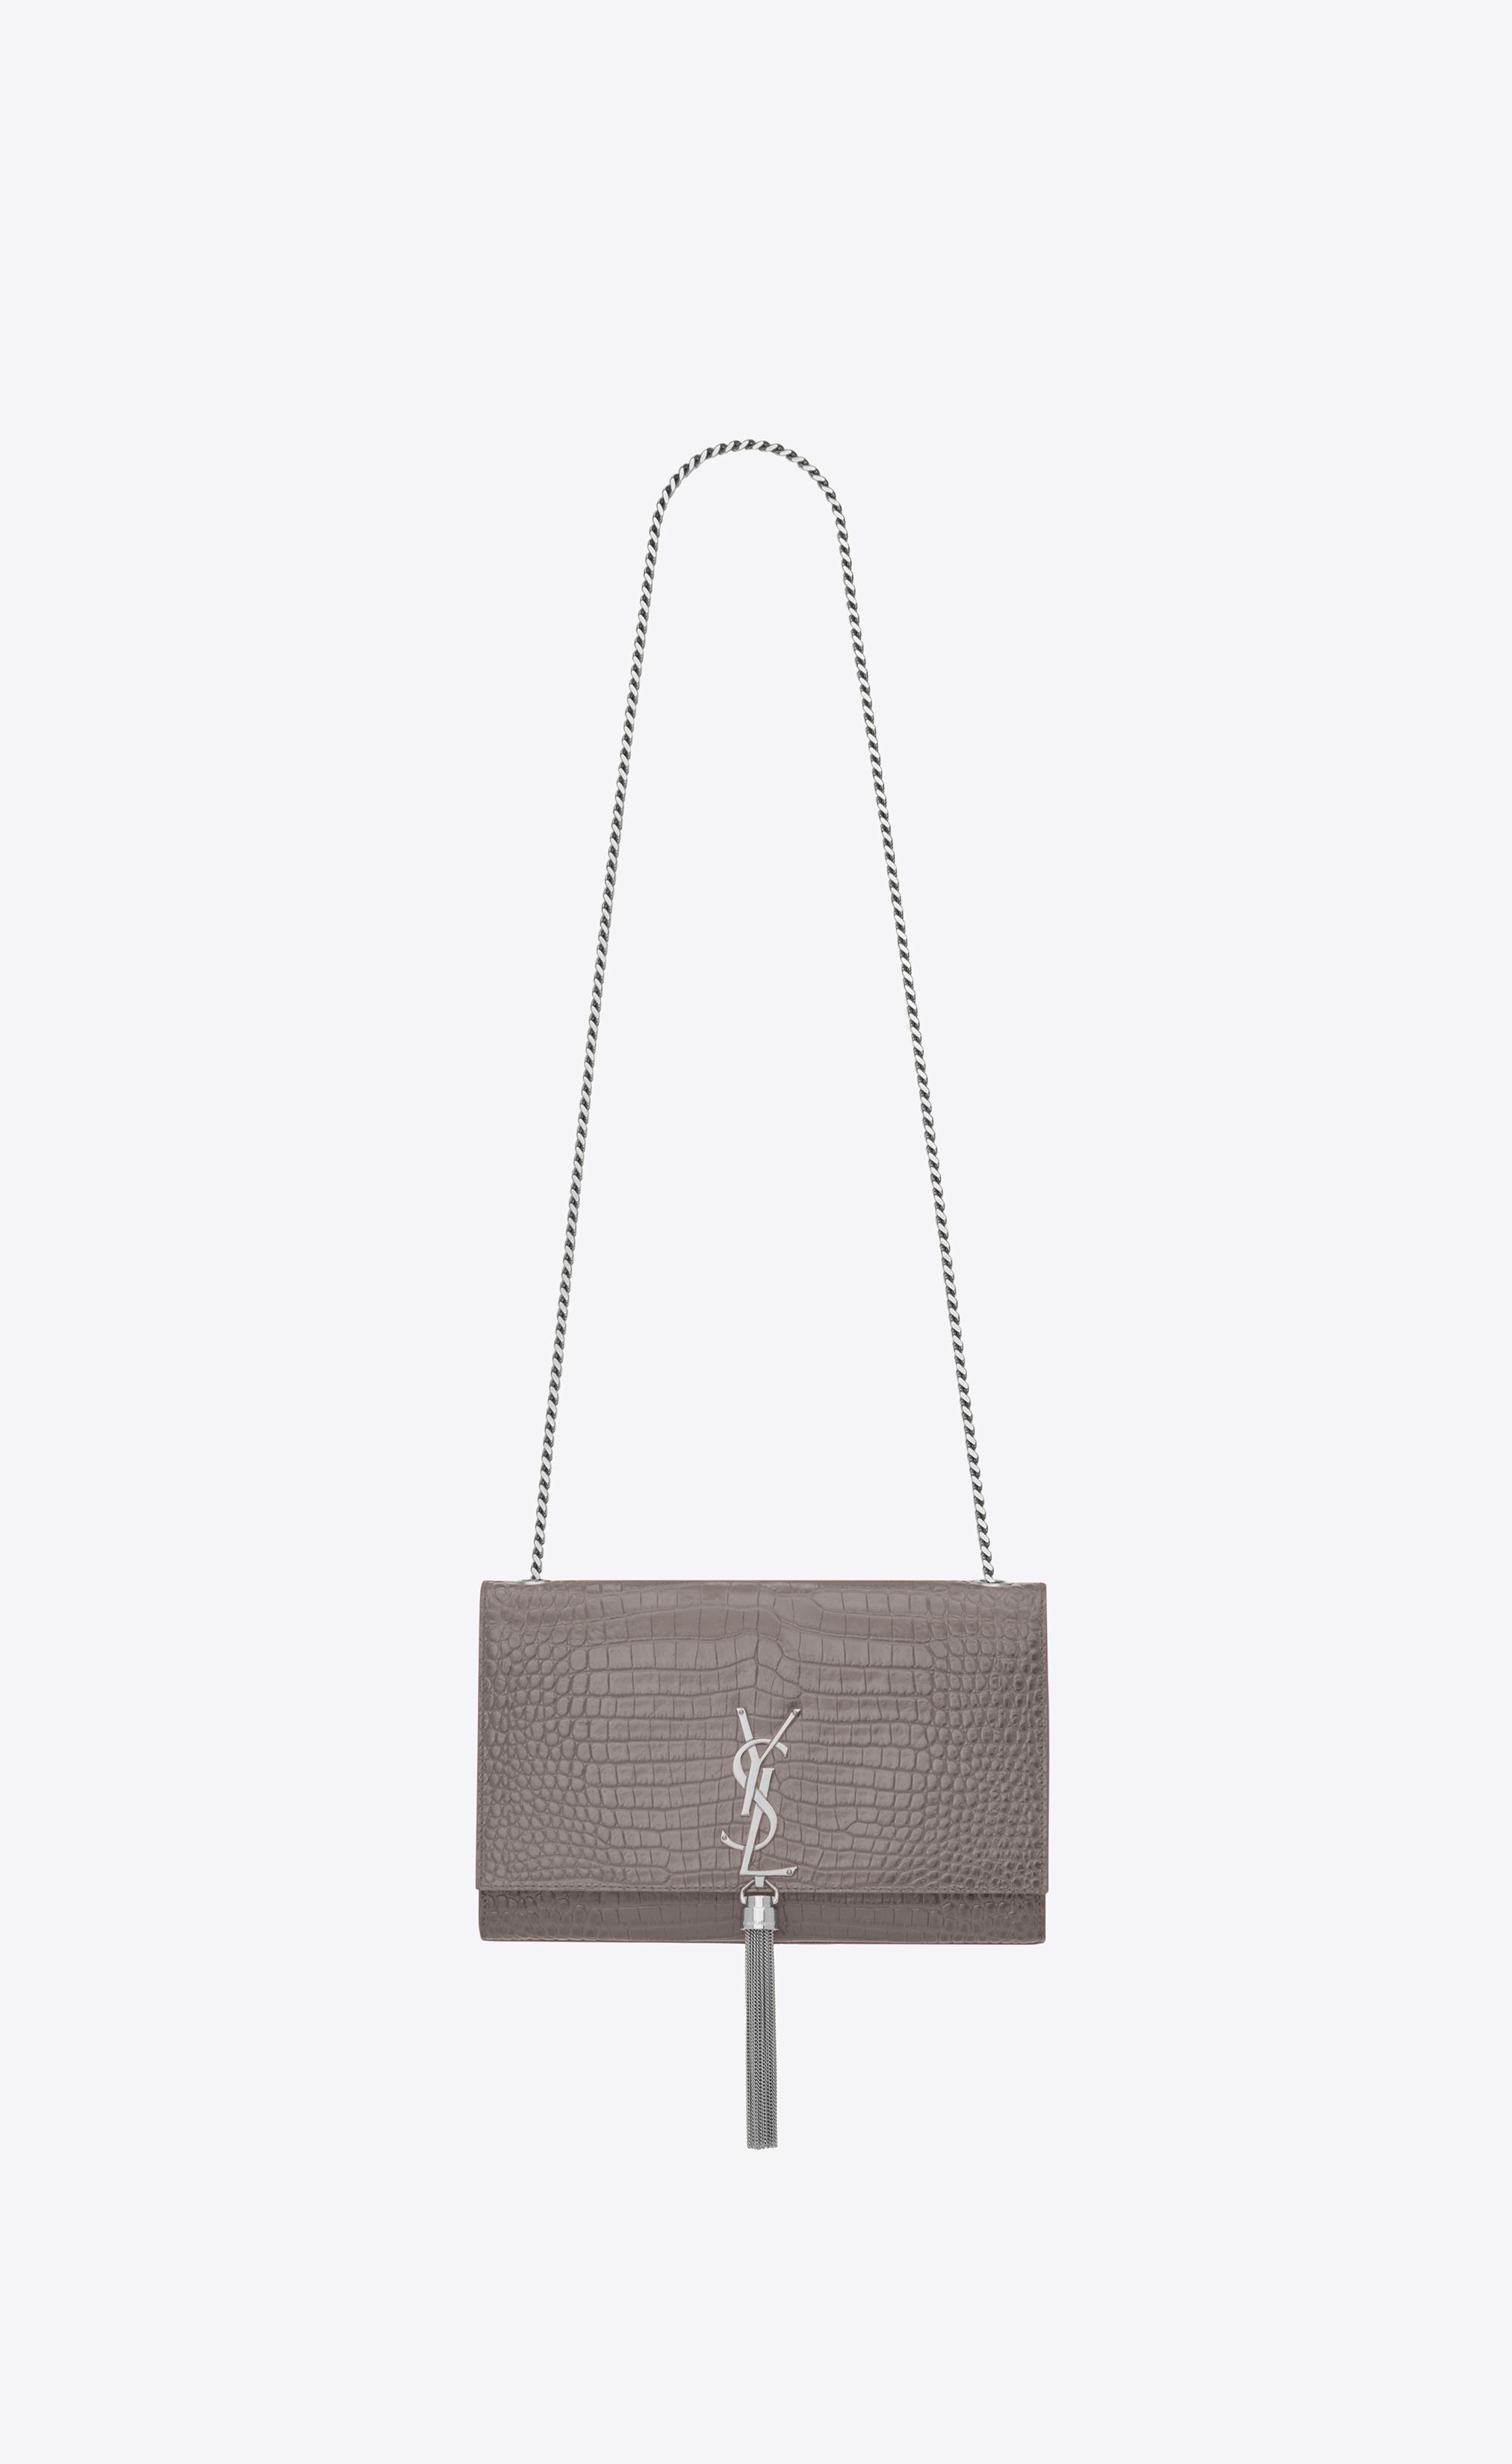 2cdb49b6379e5 Lyst - Saint Laurent Classic Medium Kate Monogram Tassel Croc ...